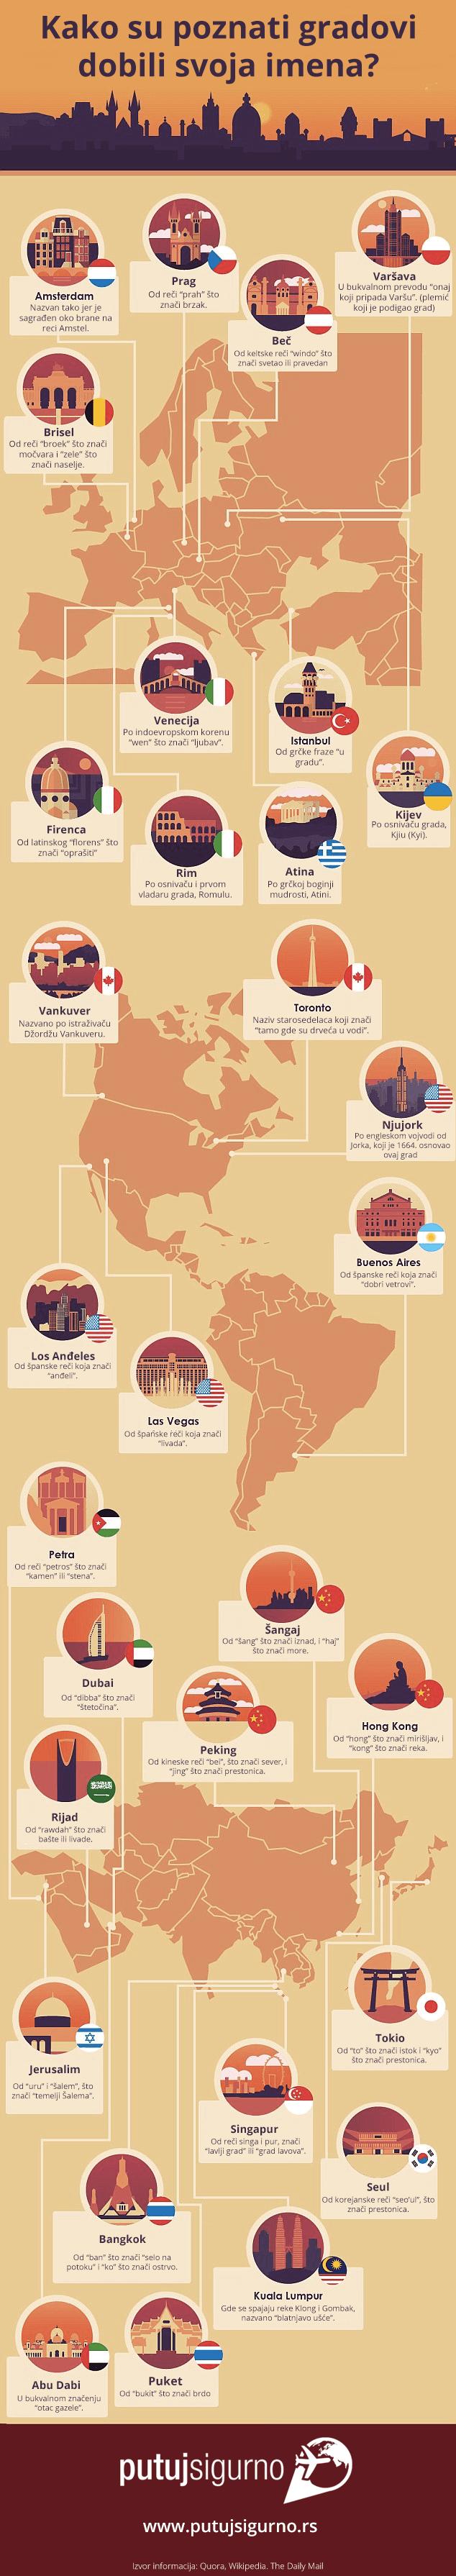 infografika značenje imena gradova